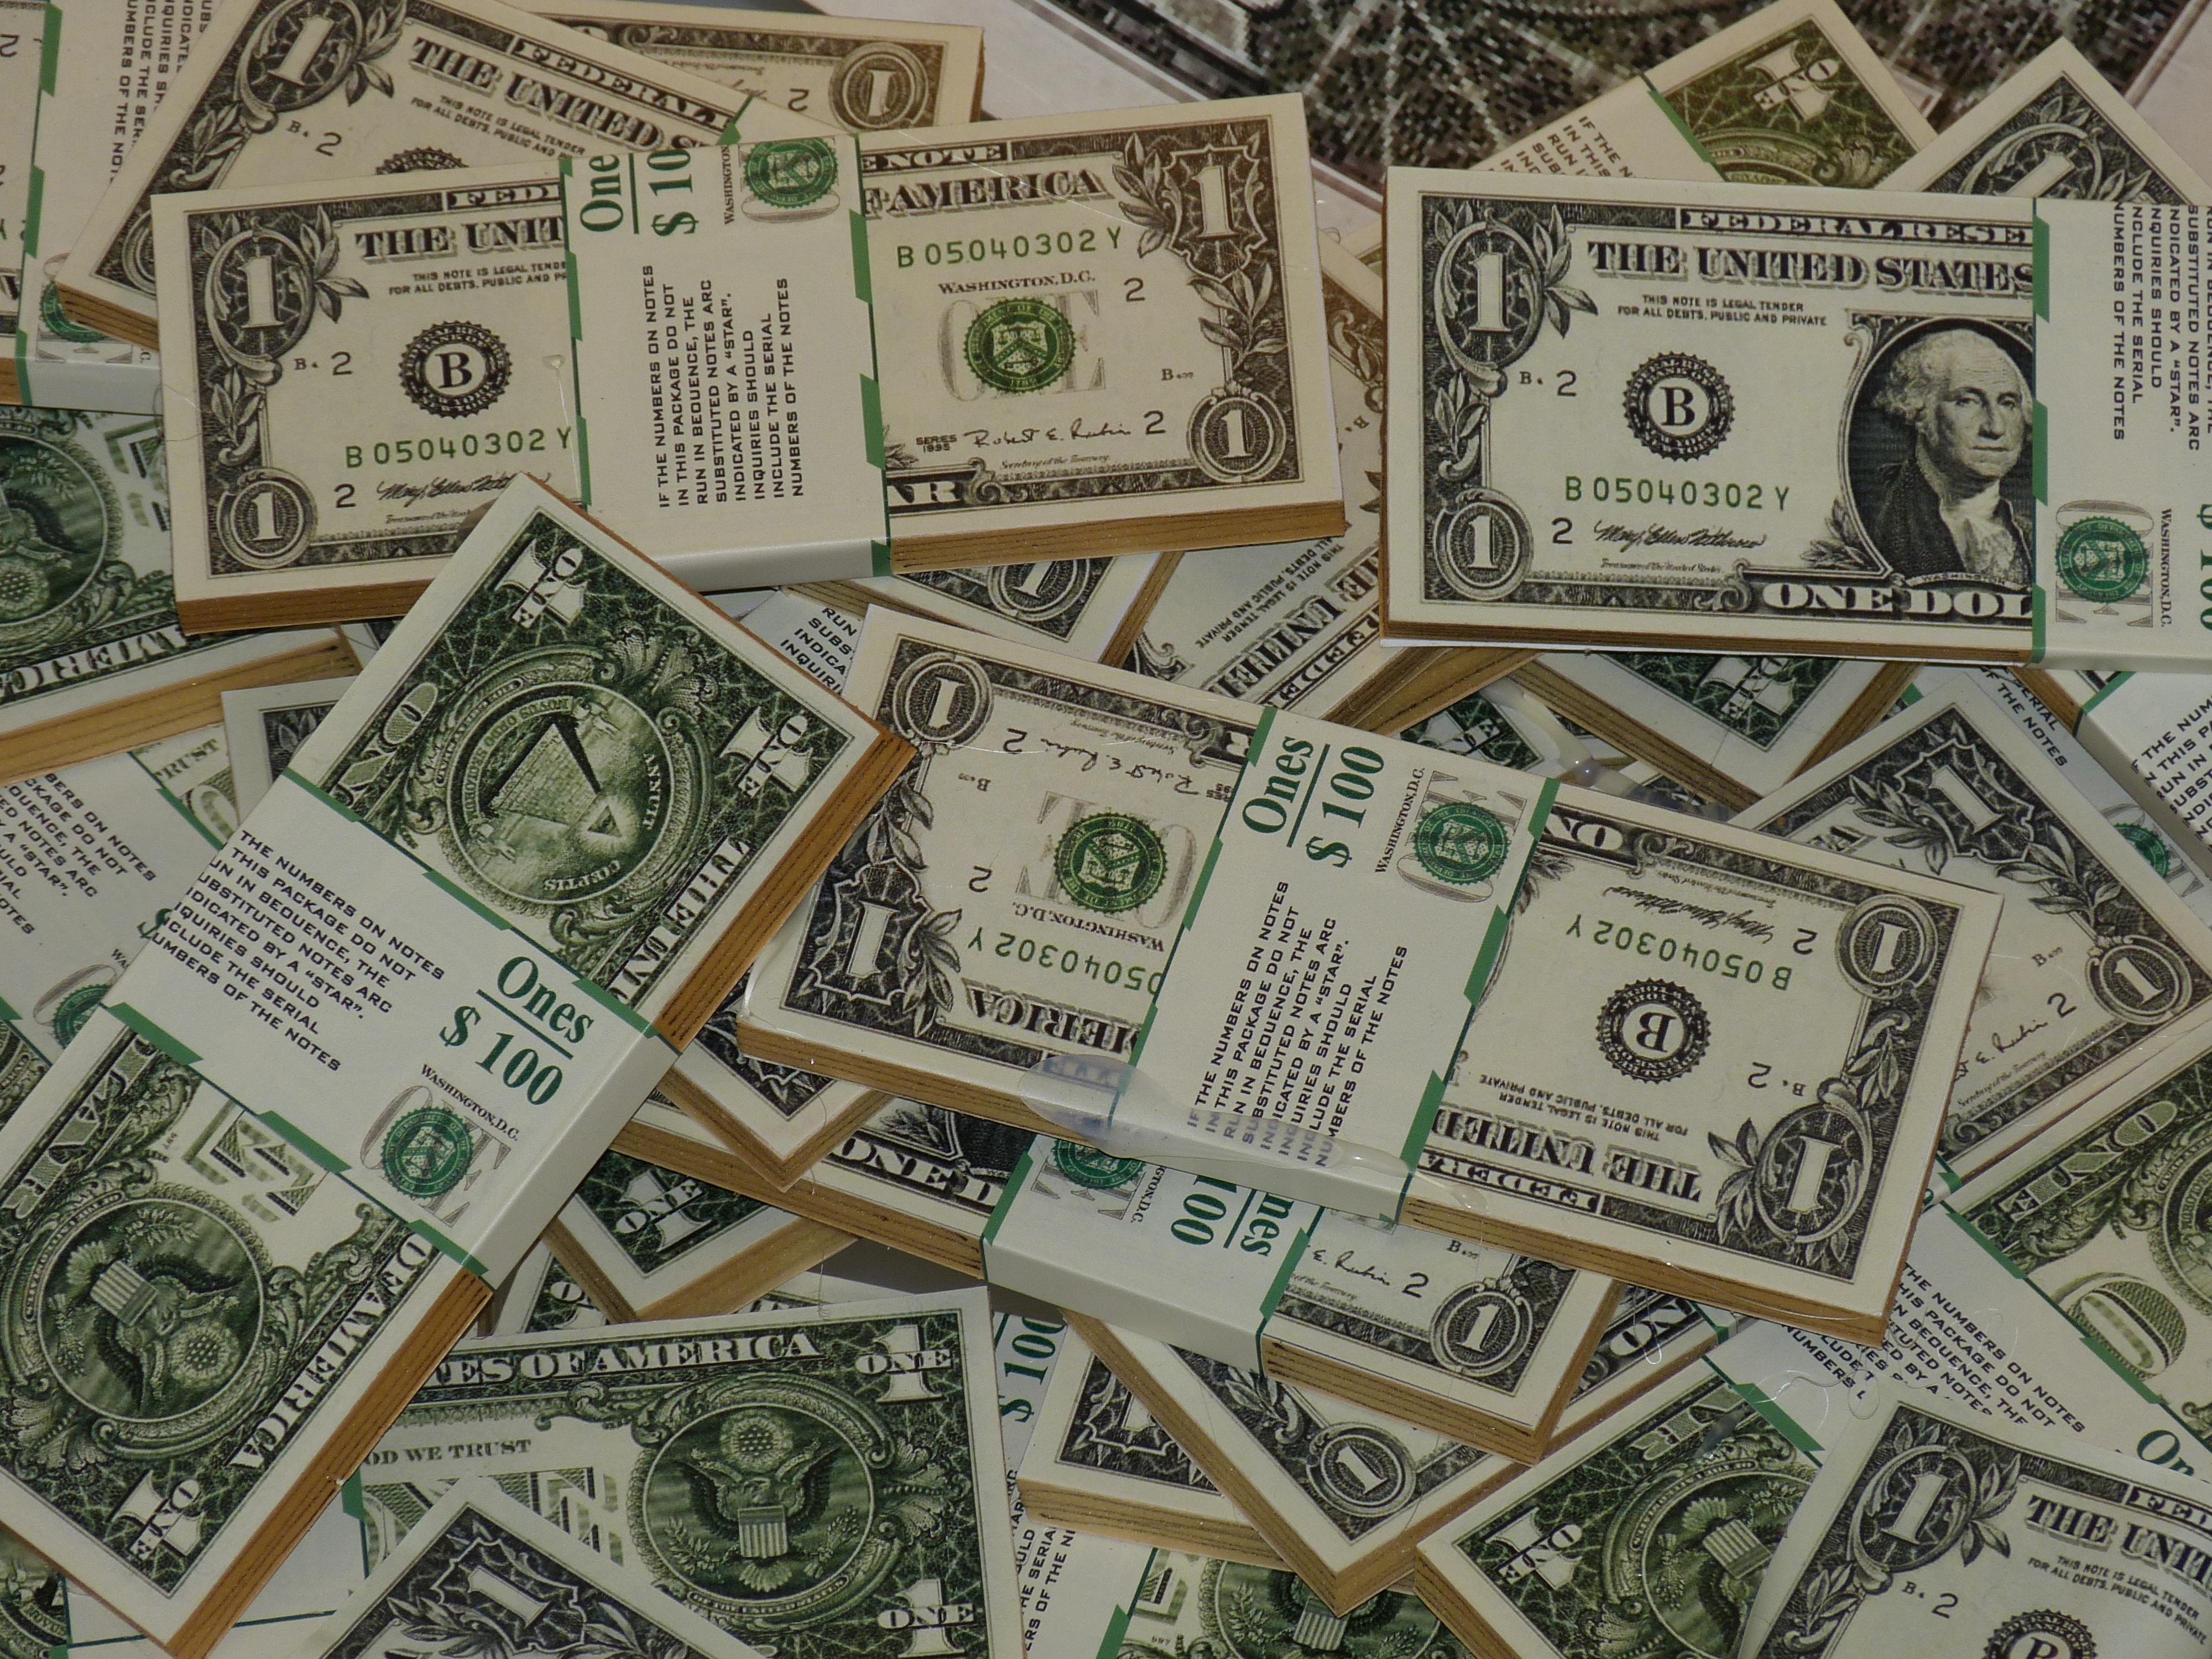 Usa Money Paper Cash Currency Dollar Seem Banknote Pay Bills Bill Forex Us